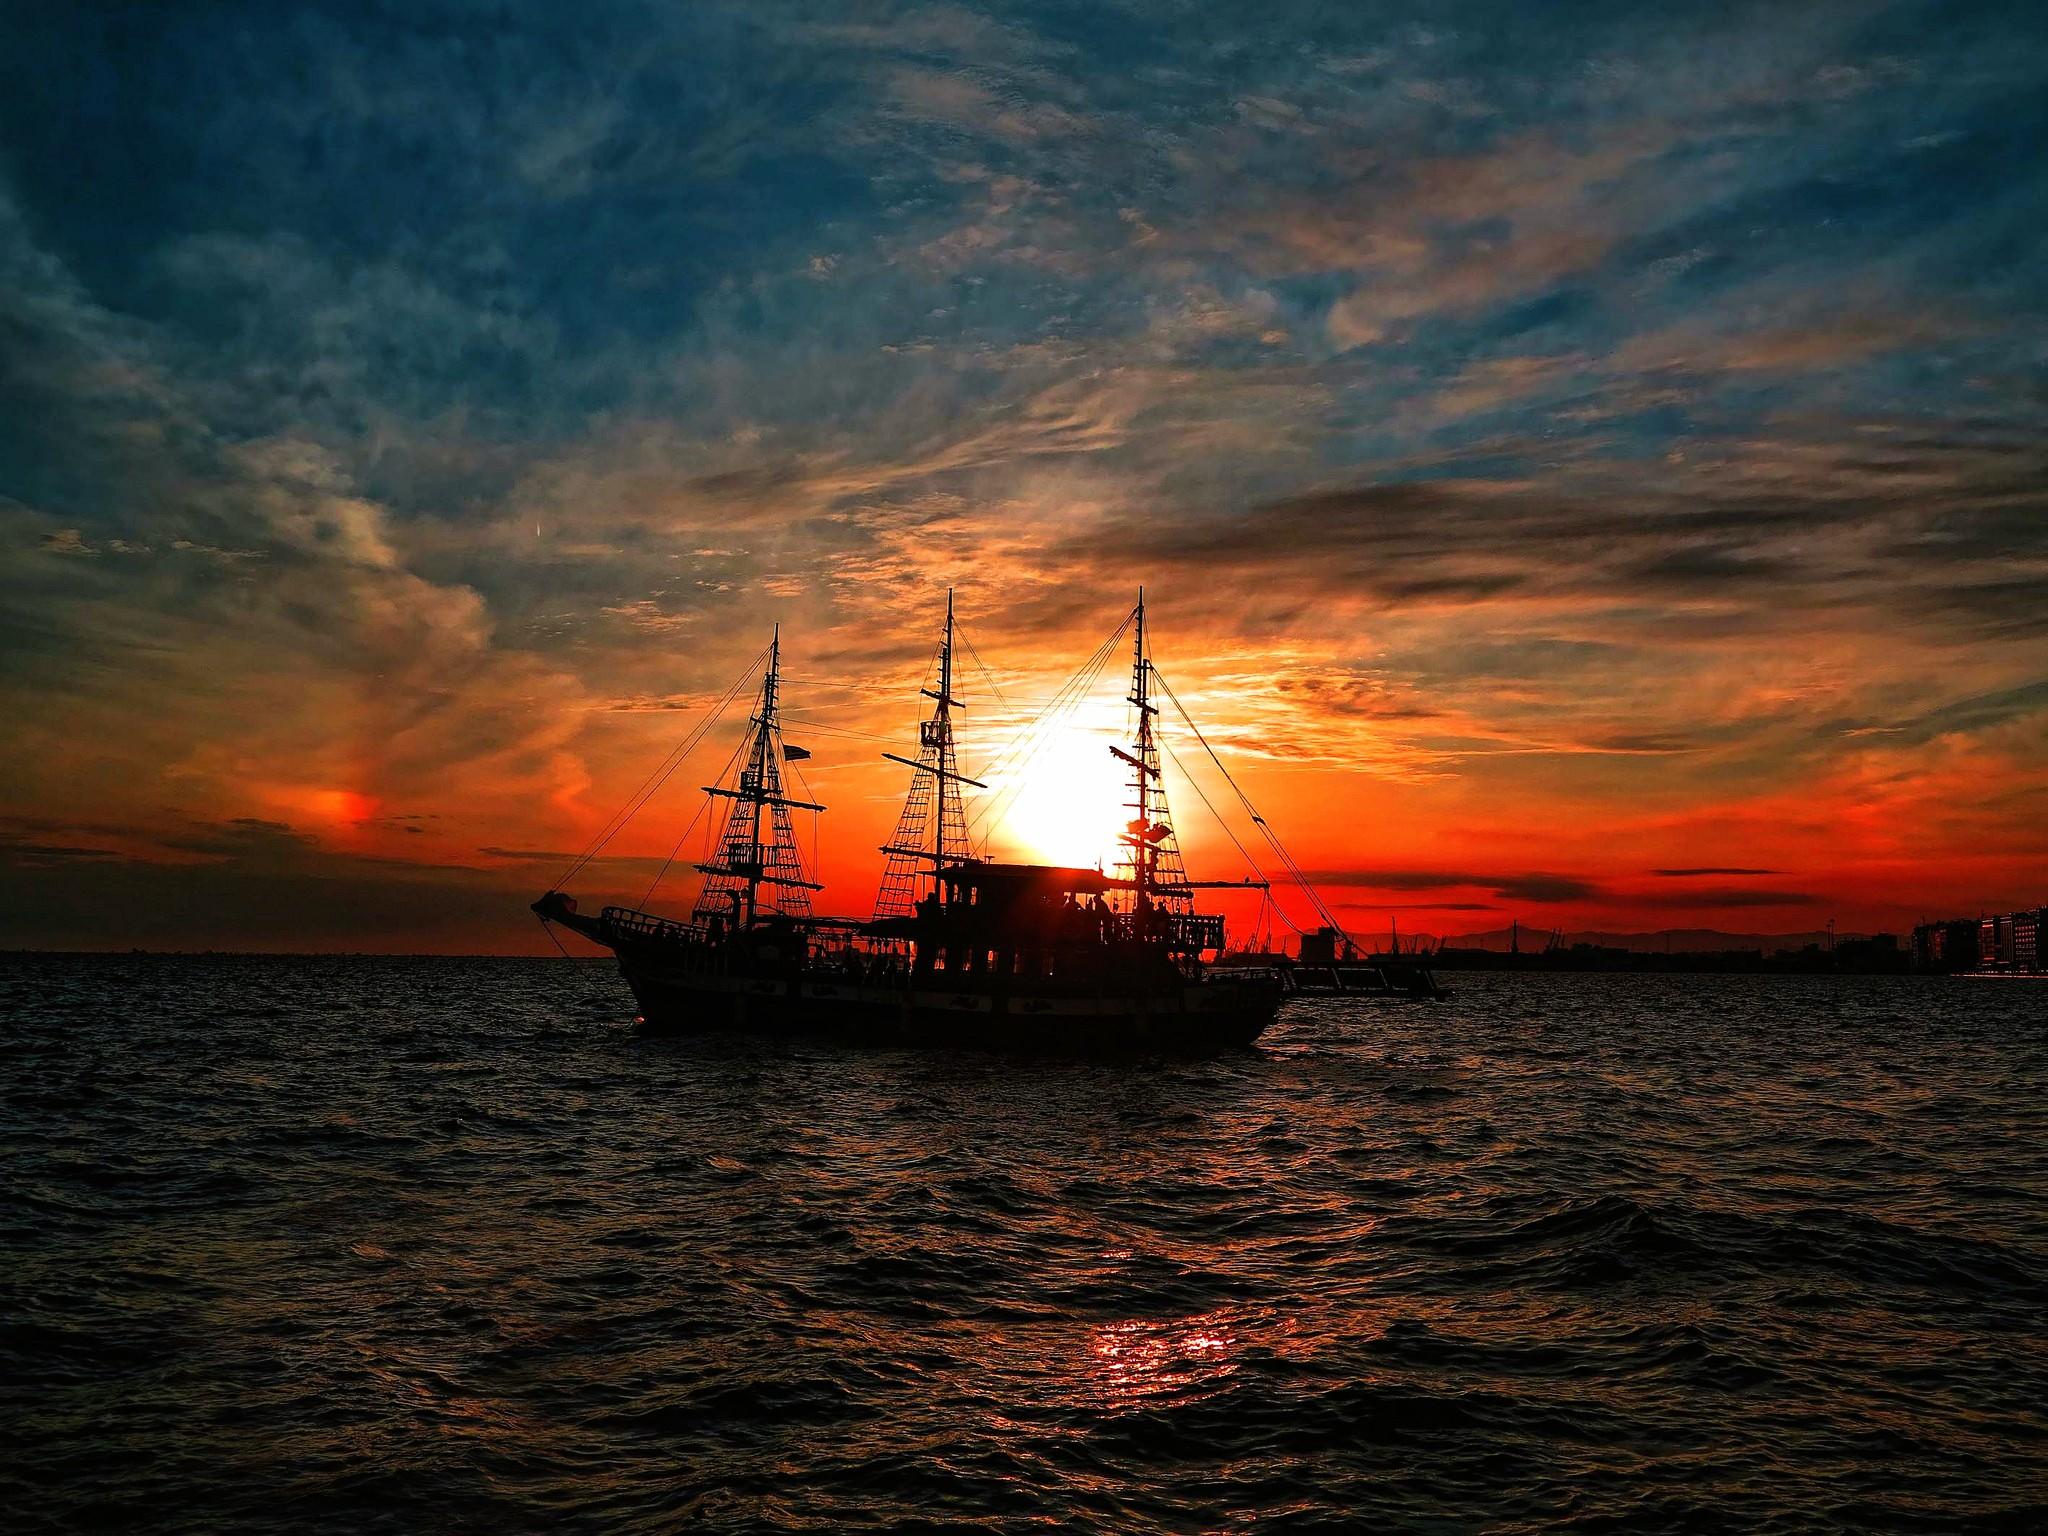 Serenity Ship Silhouette